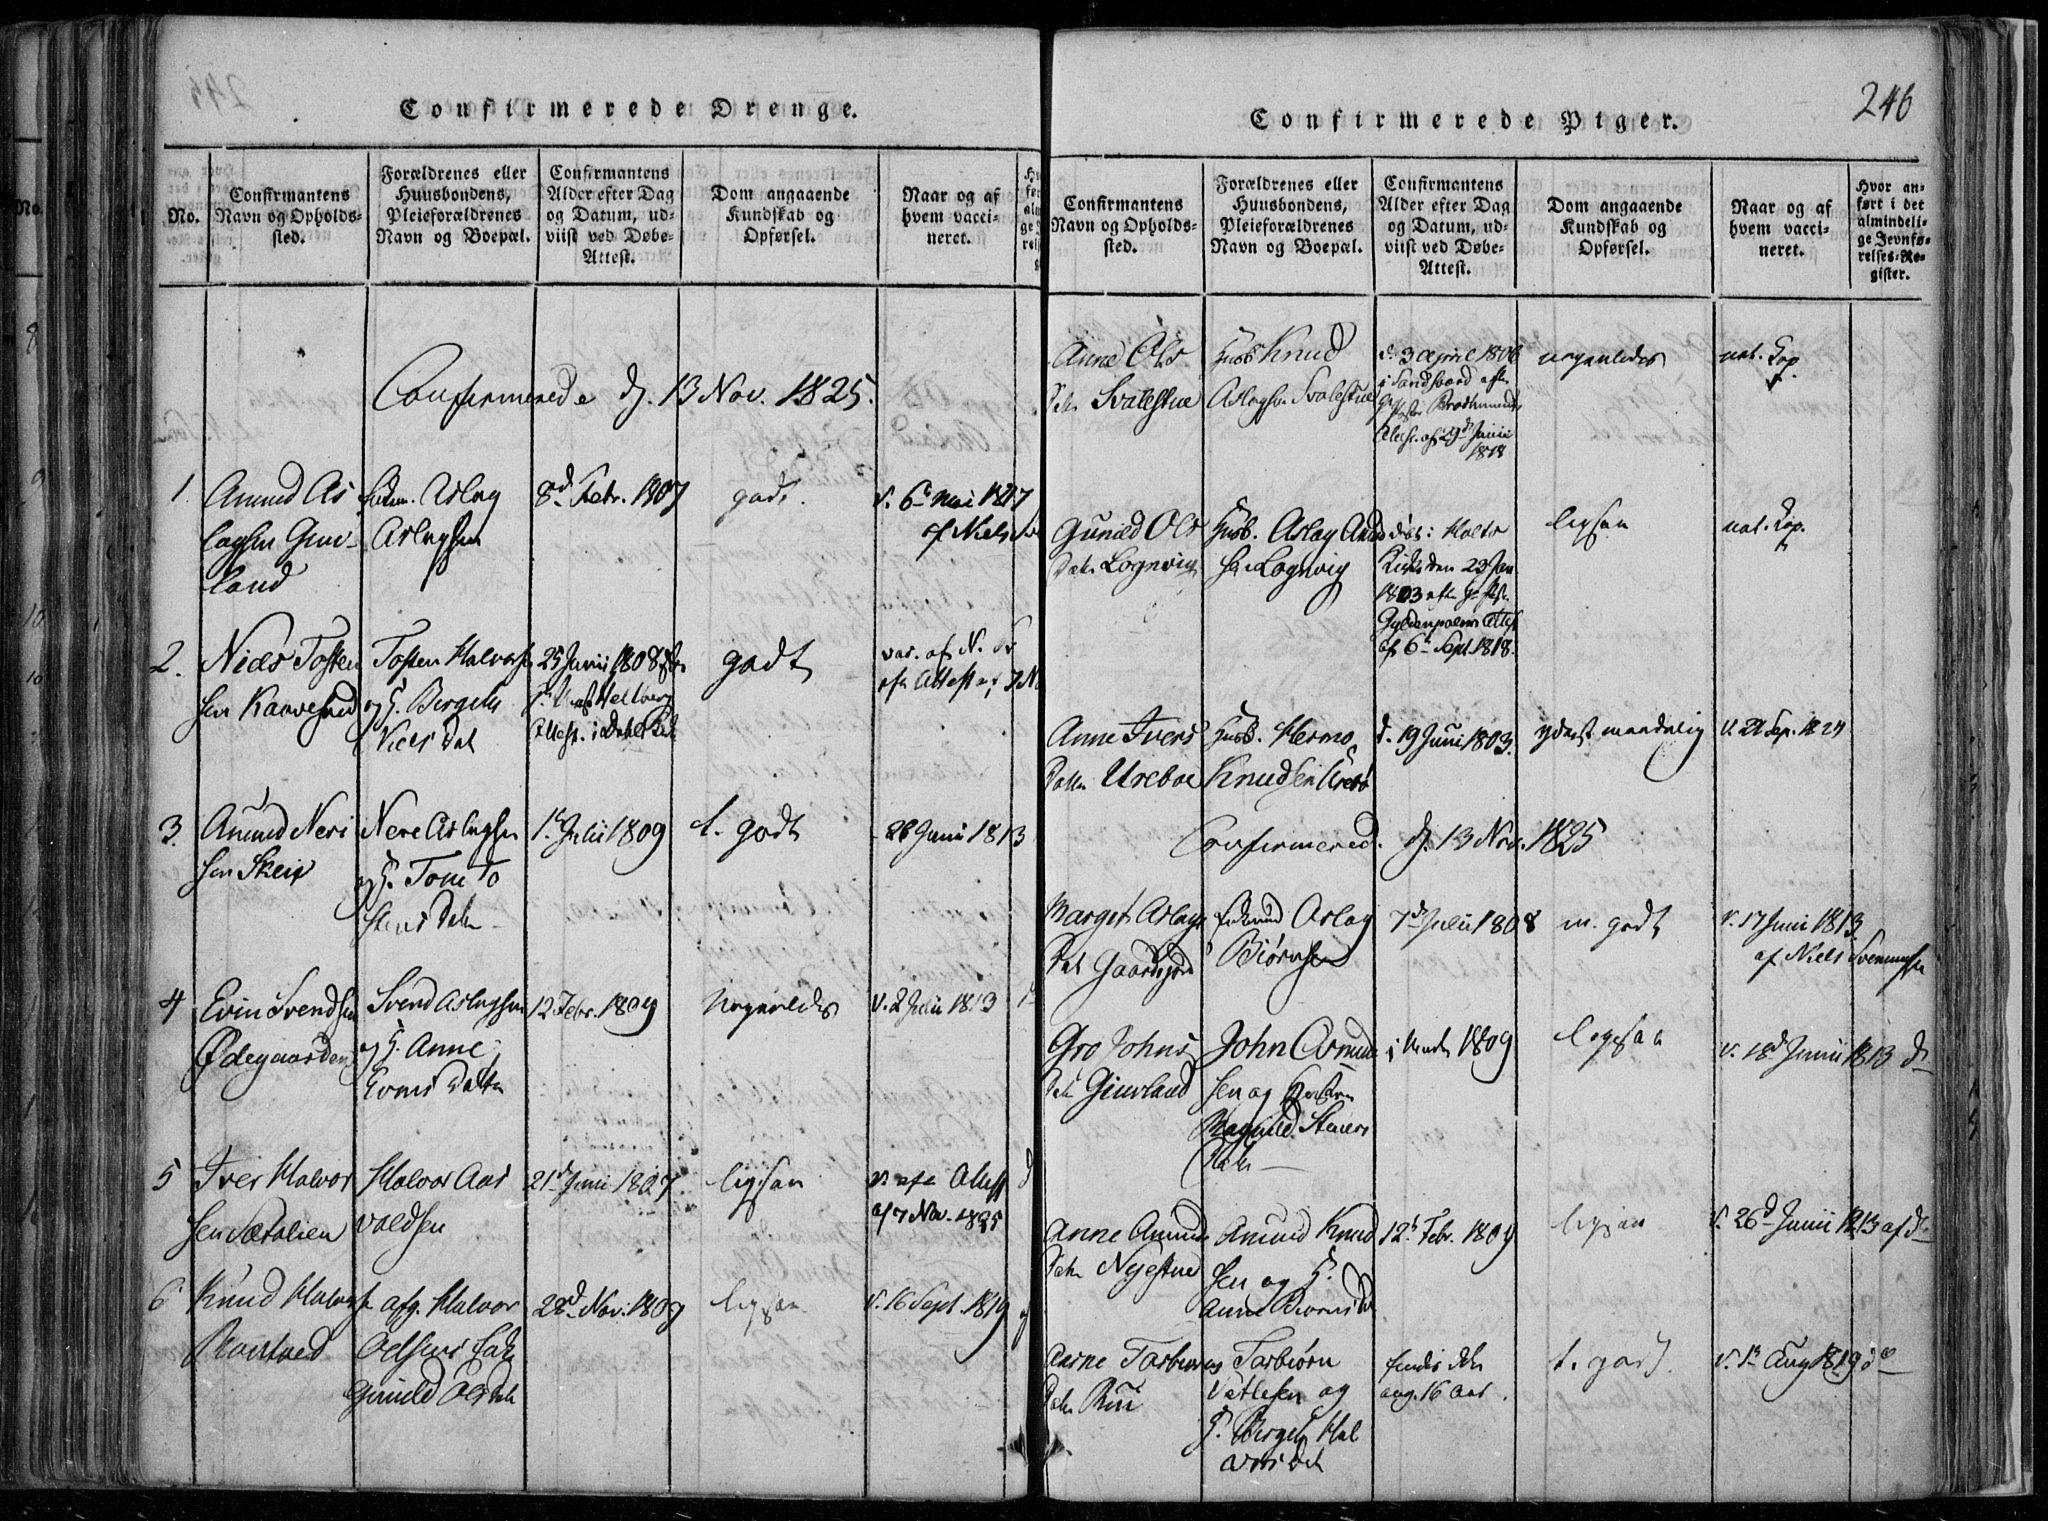 SAKO, Rauland kirkebøker, F/Fa/L0001: Ministerialbok nr. 1, 1814-1859, s. 246